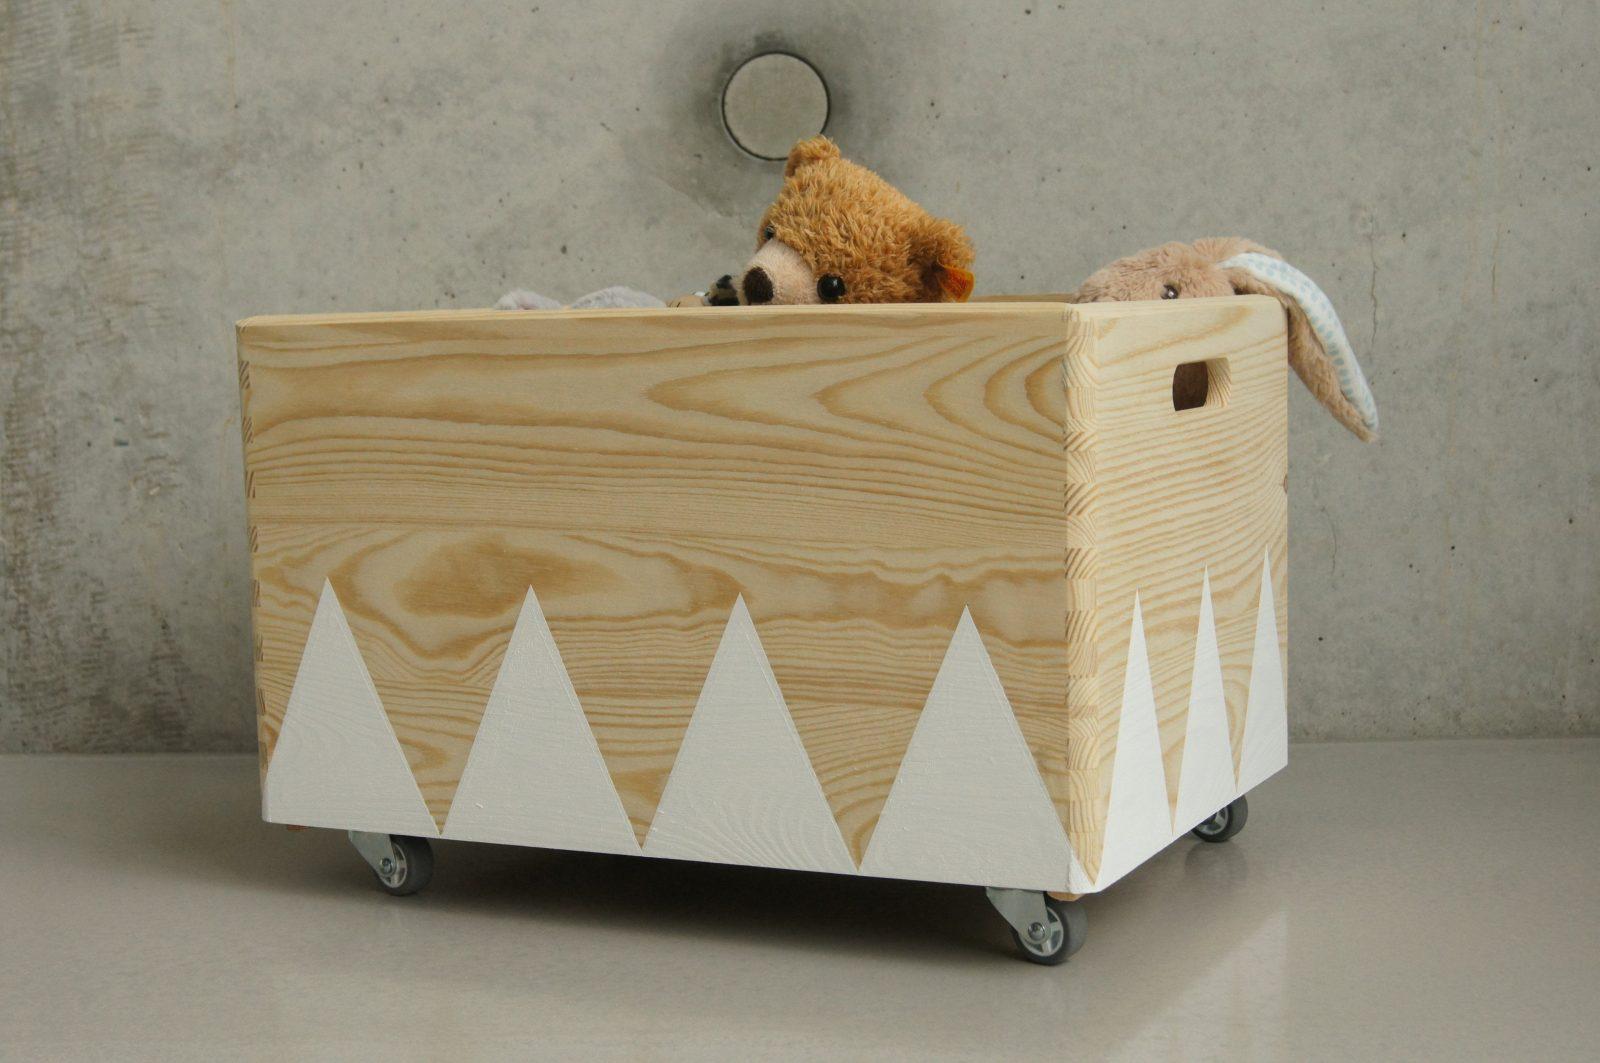 Luxus Kiste Mit Rollen Kisten Boxen Holz Spielzeugkiste Rollen von Spielzeugkiste Holz Mit Deckel Photo